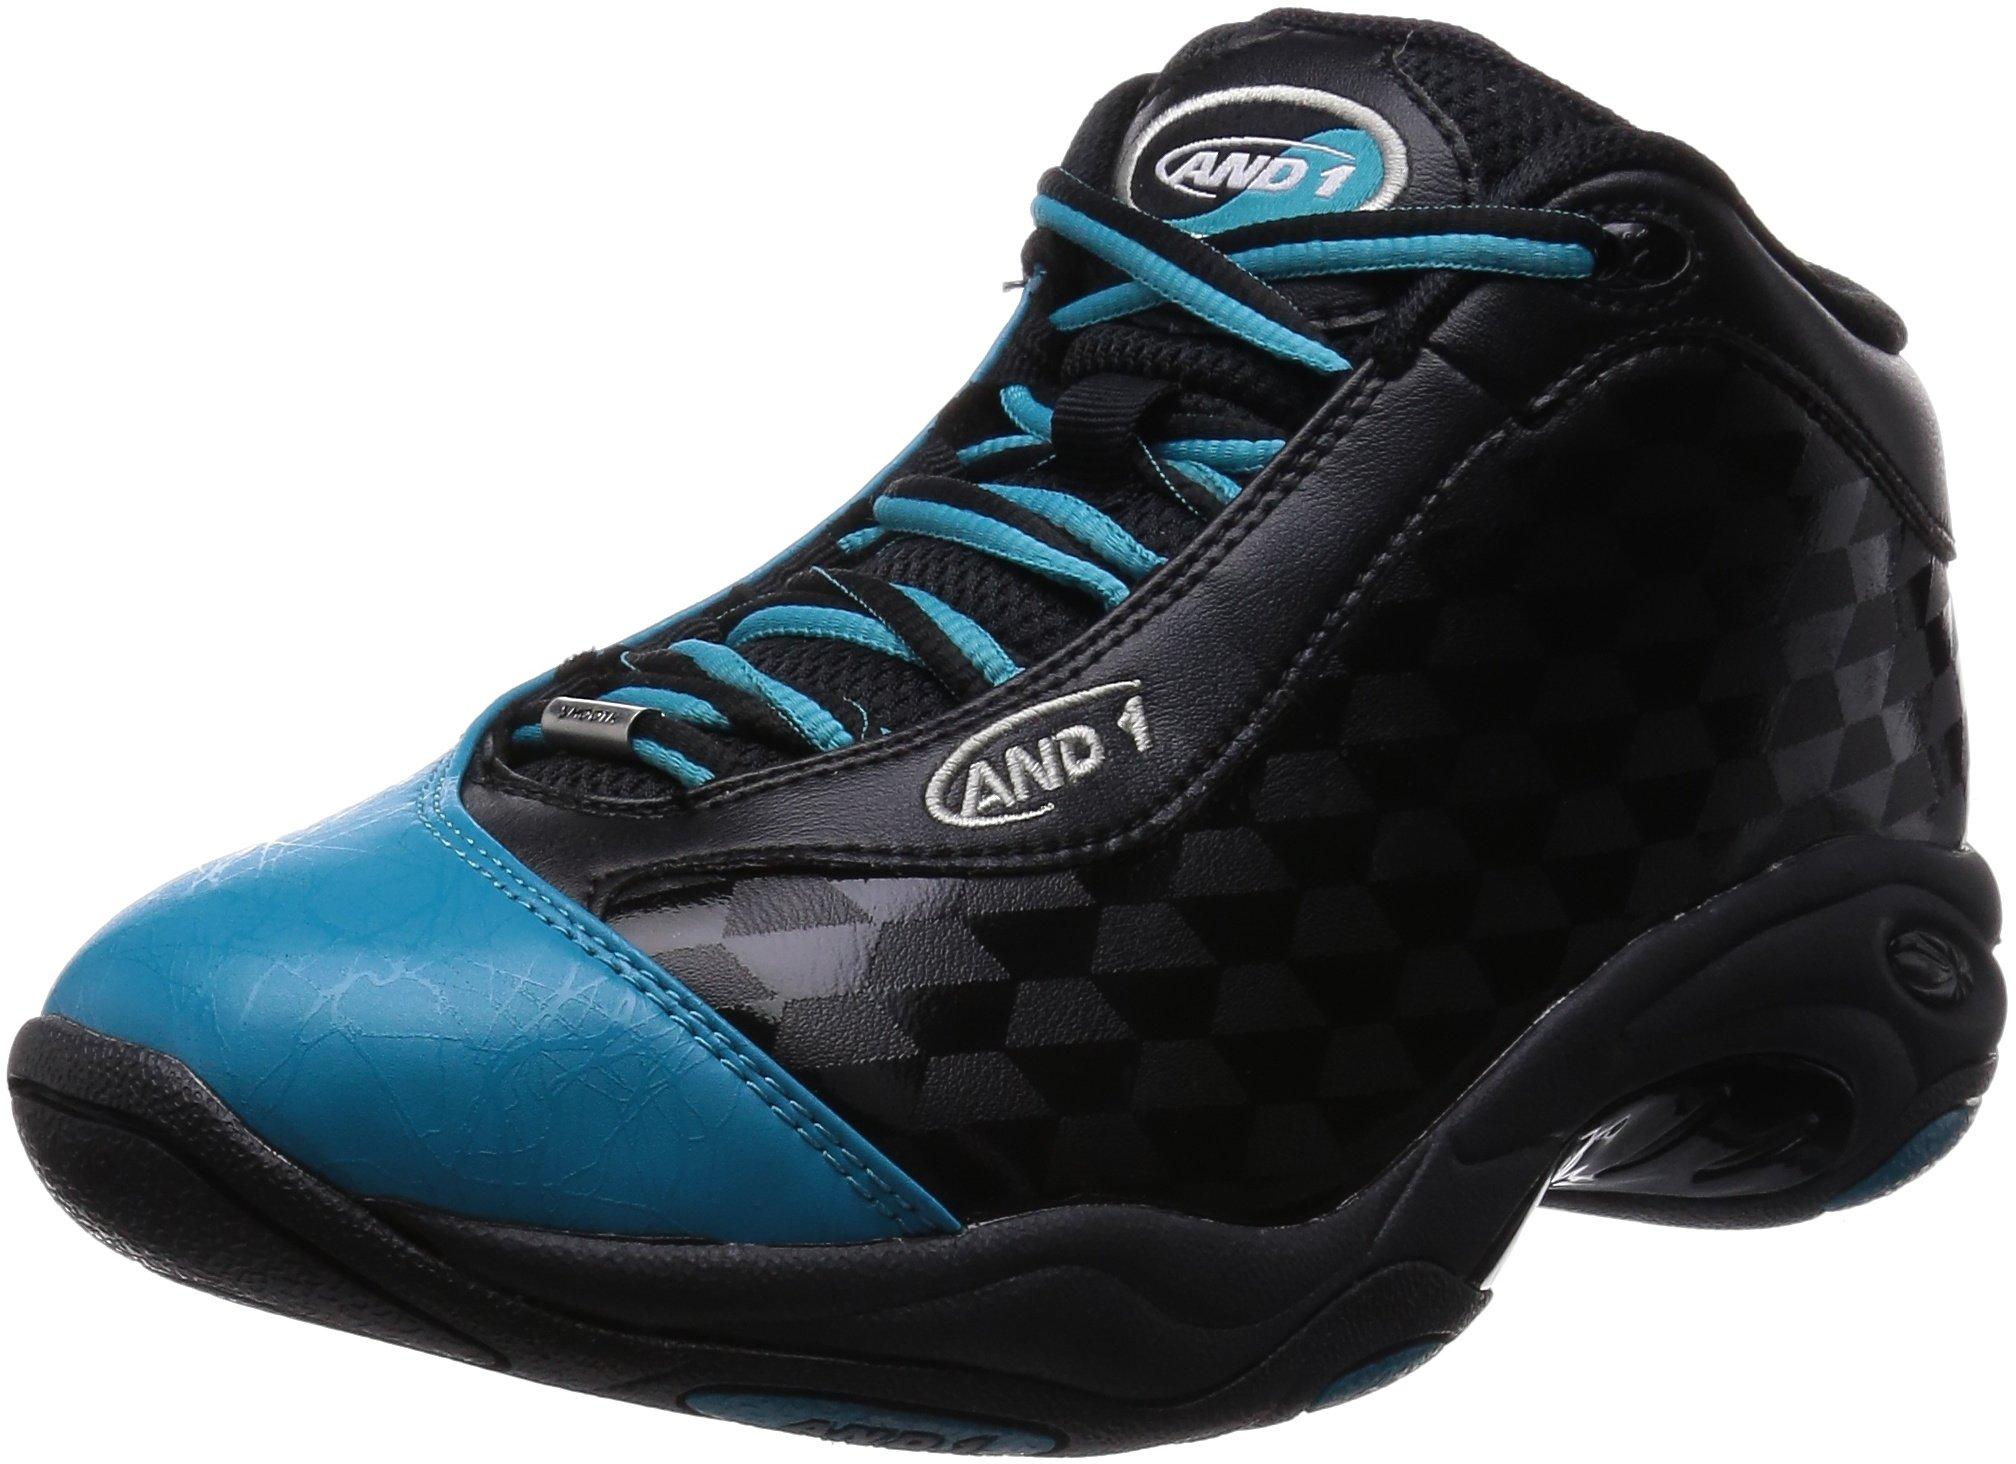 AND1 Sneaker Black Capri Breeze